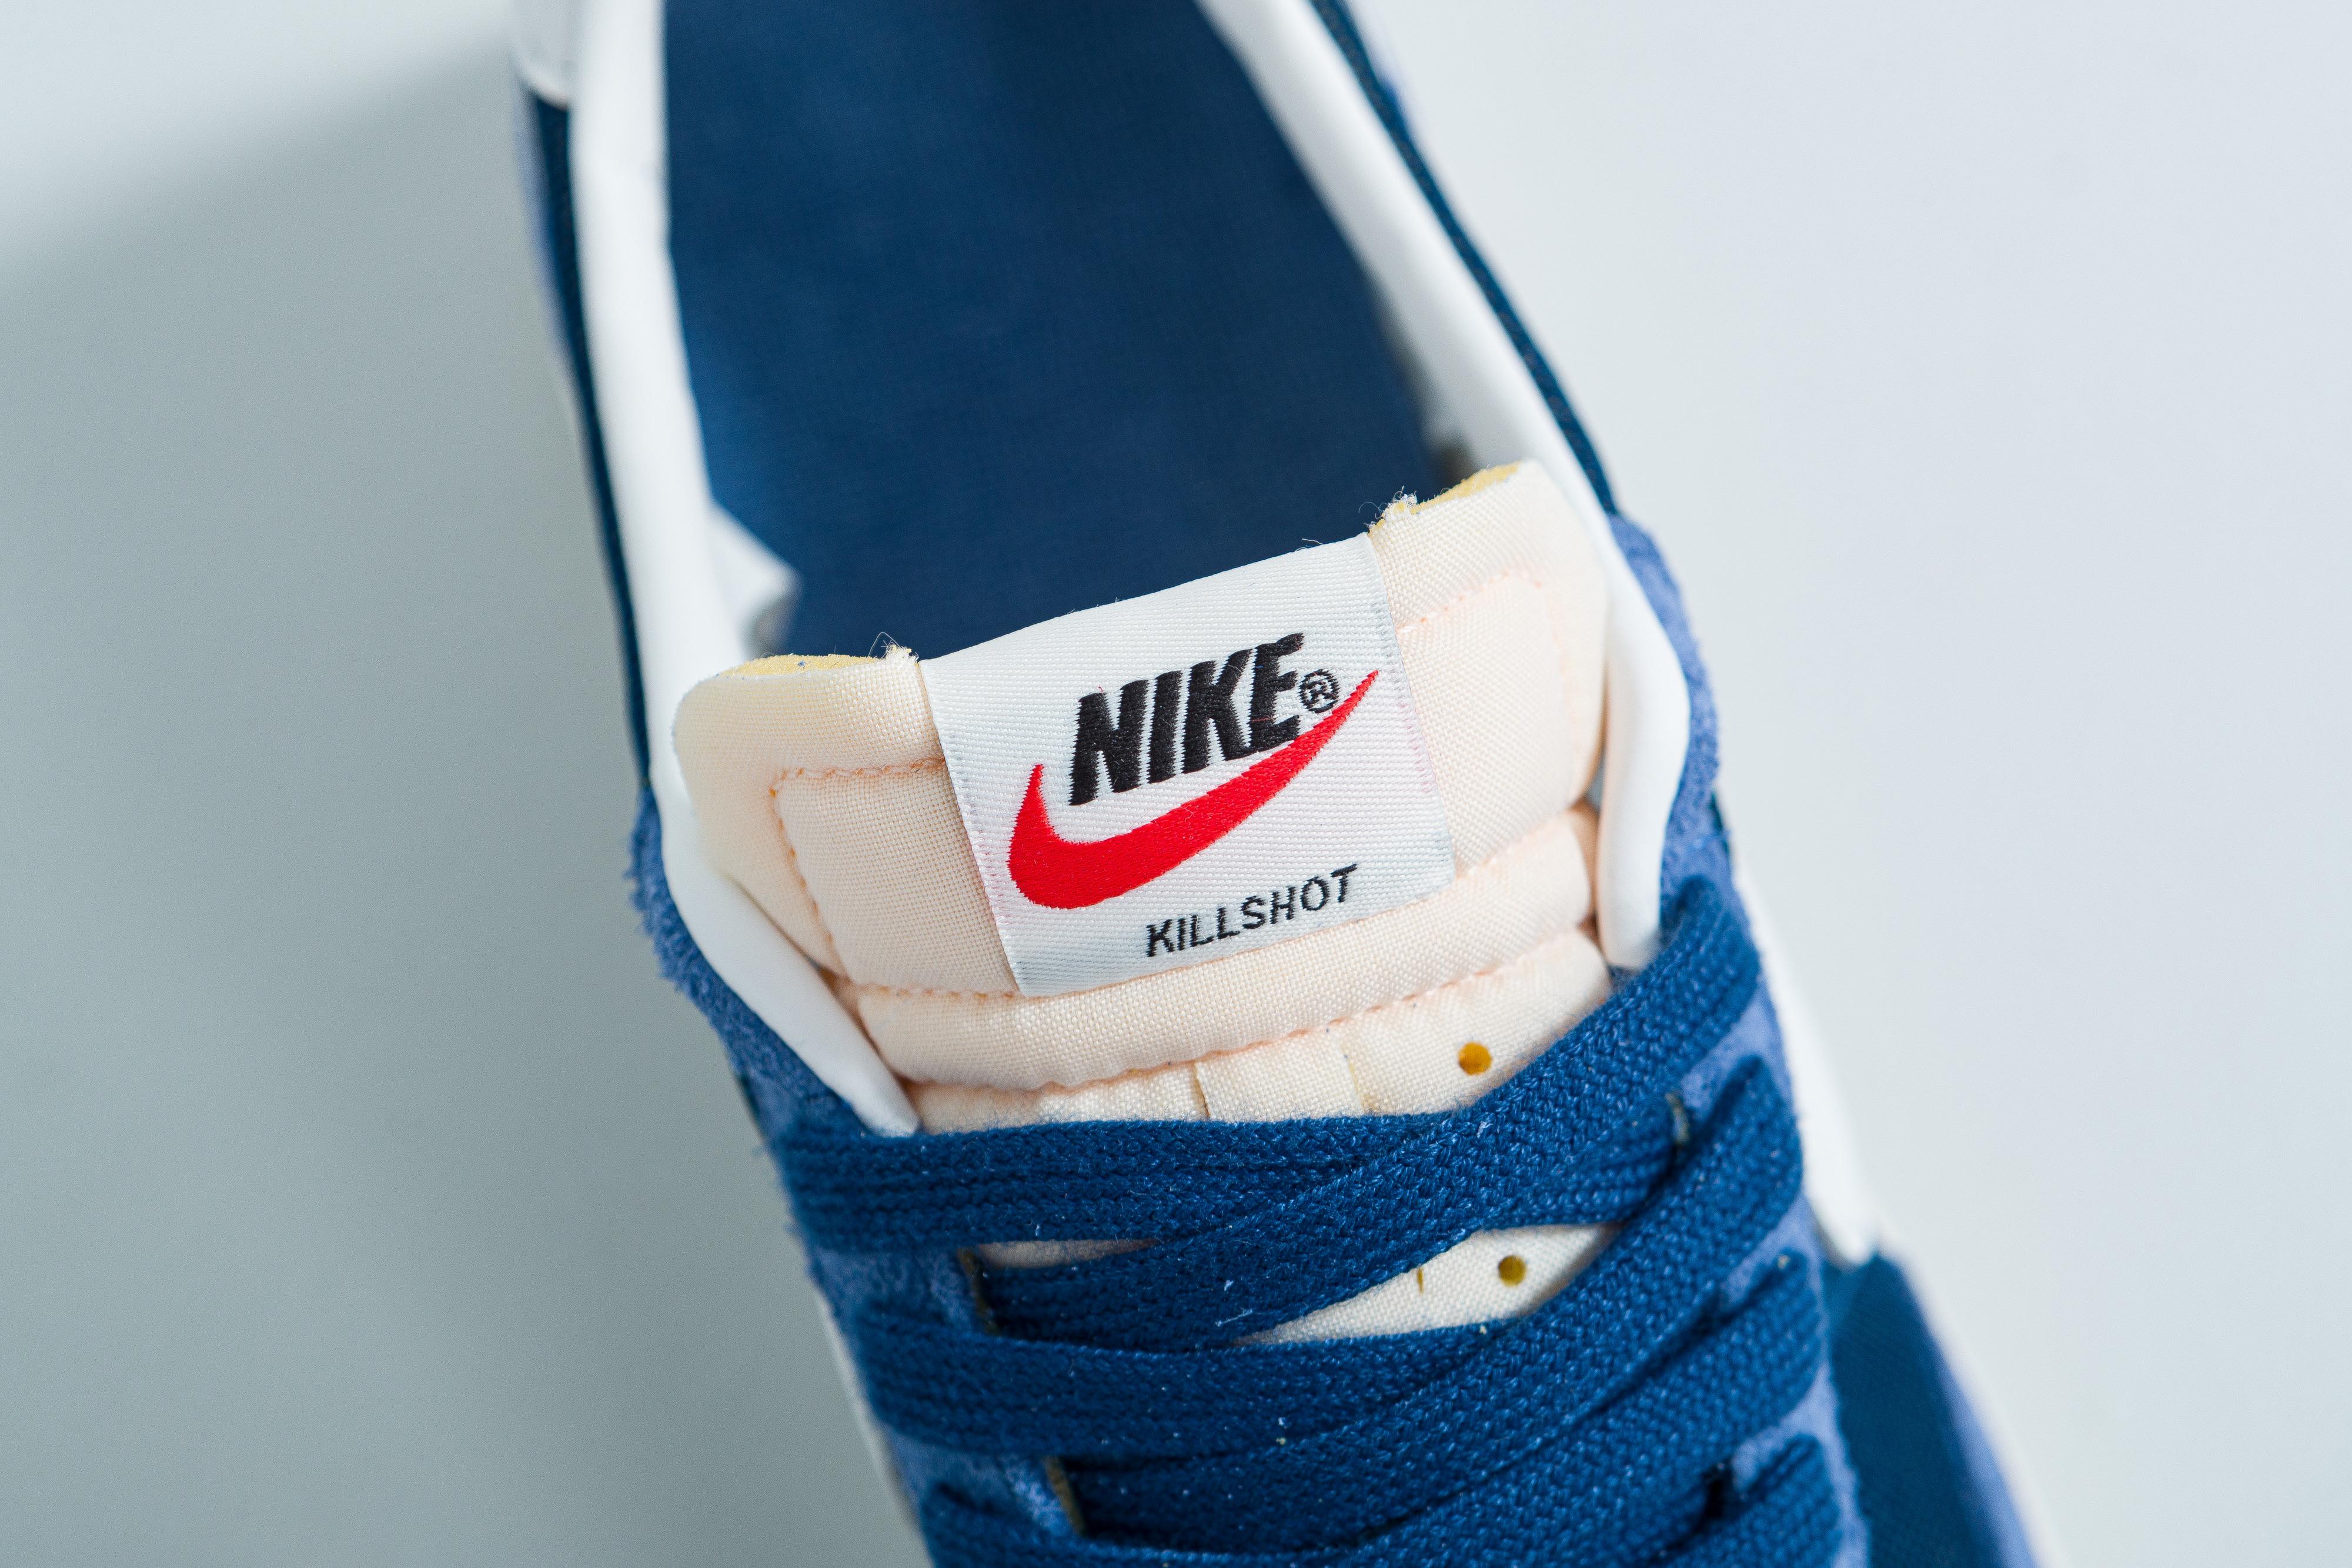 Nike Killshot FW20 Dark Beetroot, Coastal Blue, Off Noir